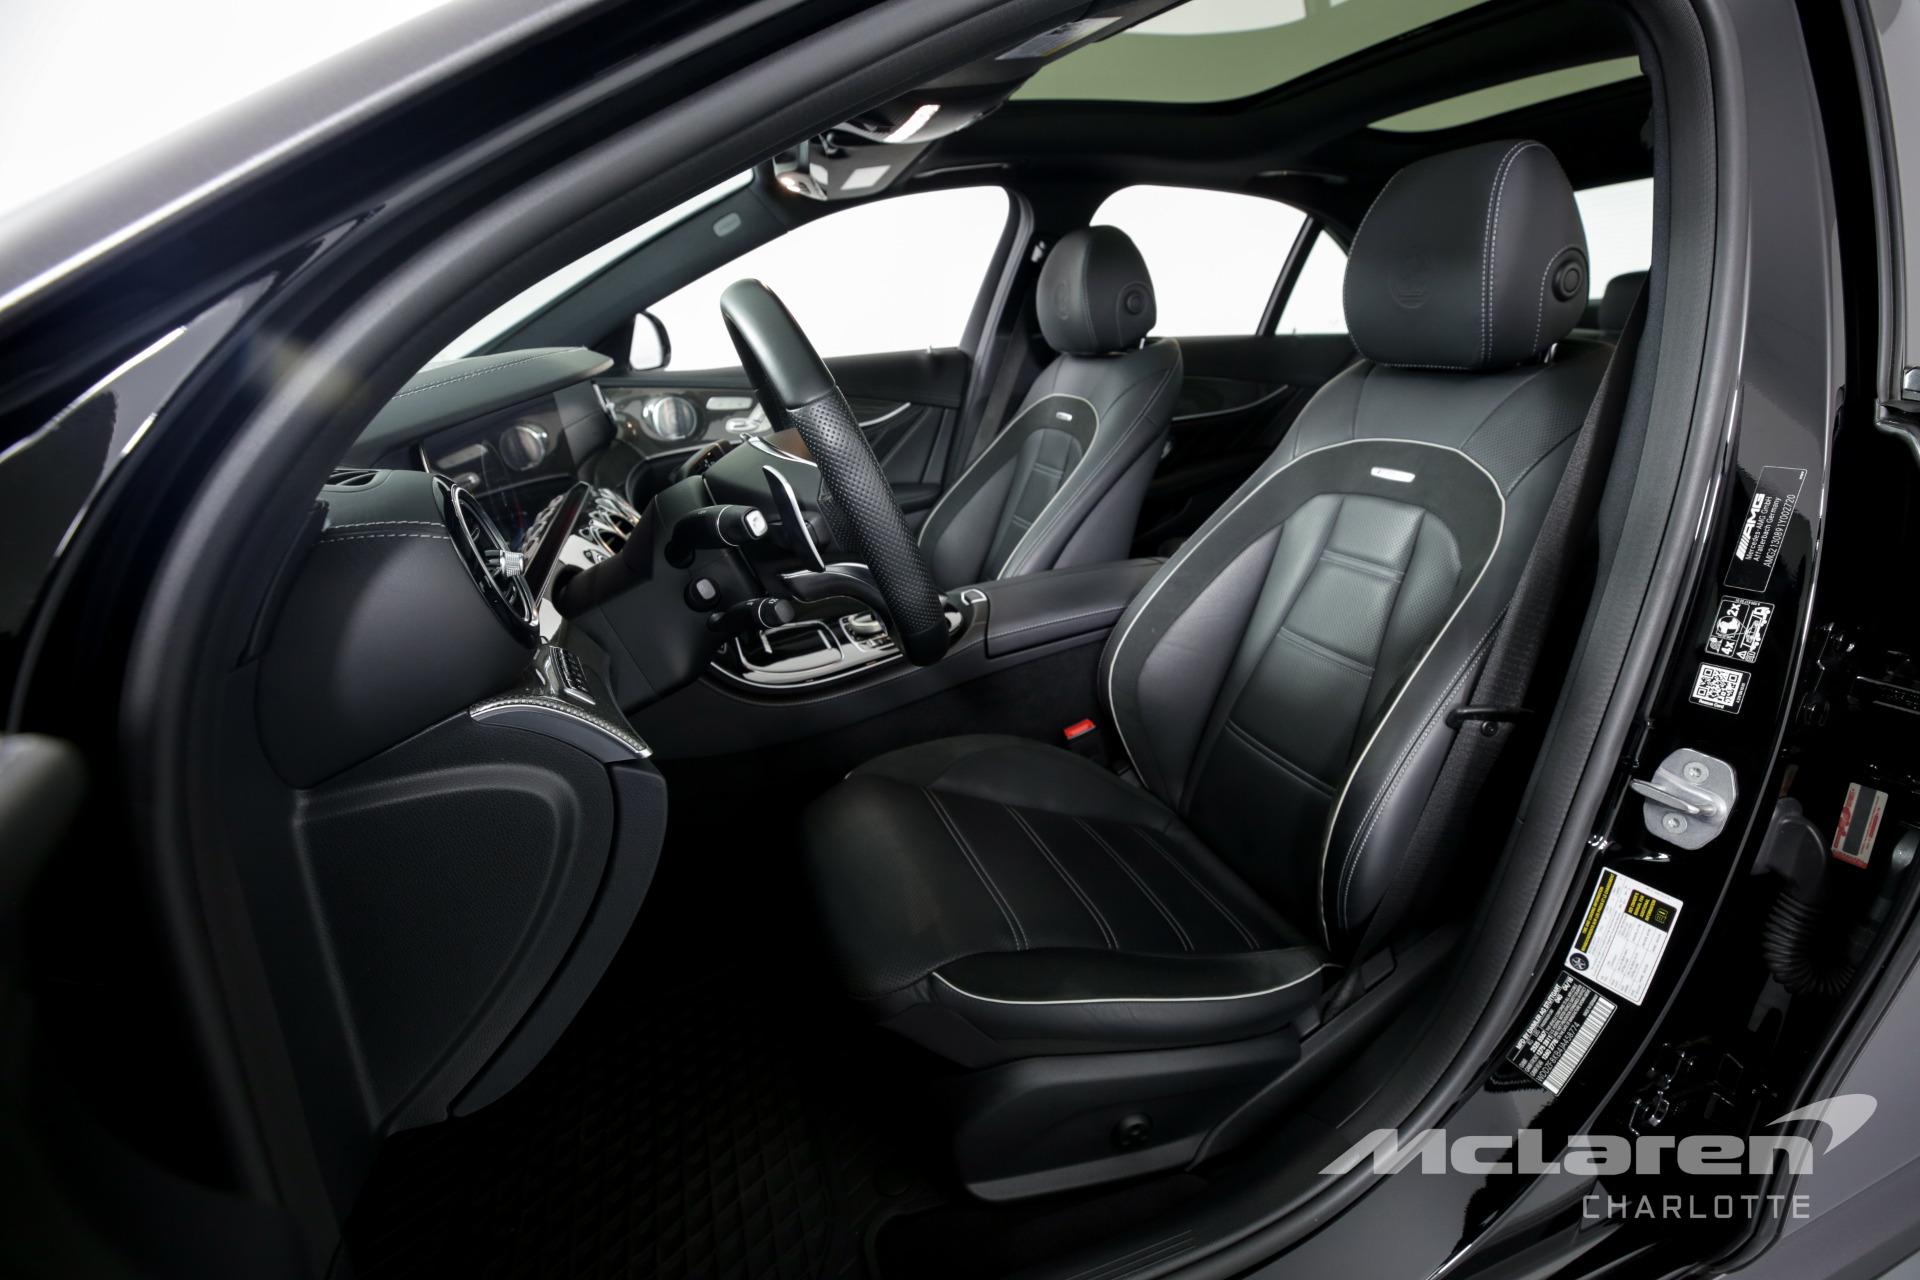 Used 2018 Mercedes-Benz E-Class AMG E 63 S | Charlotte, NC